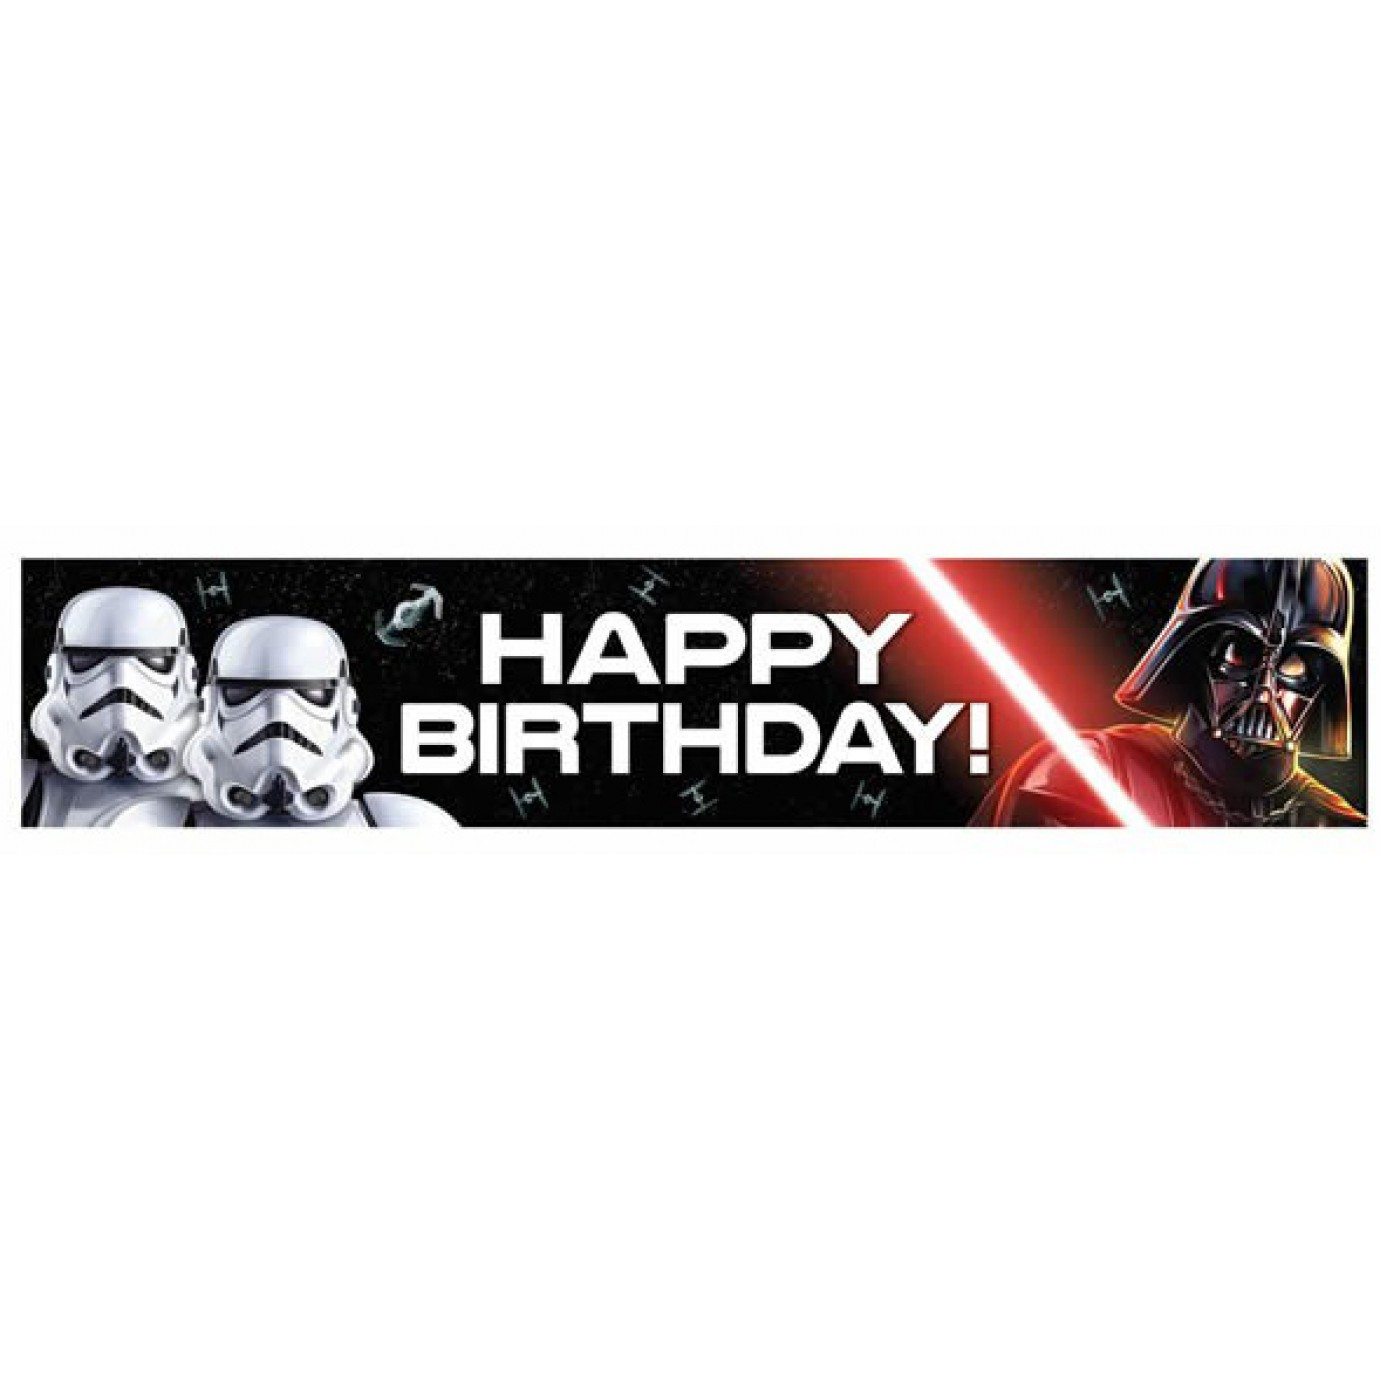 Star Wars Birthday Party Decorations